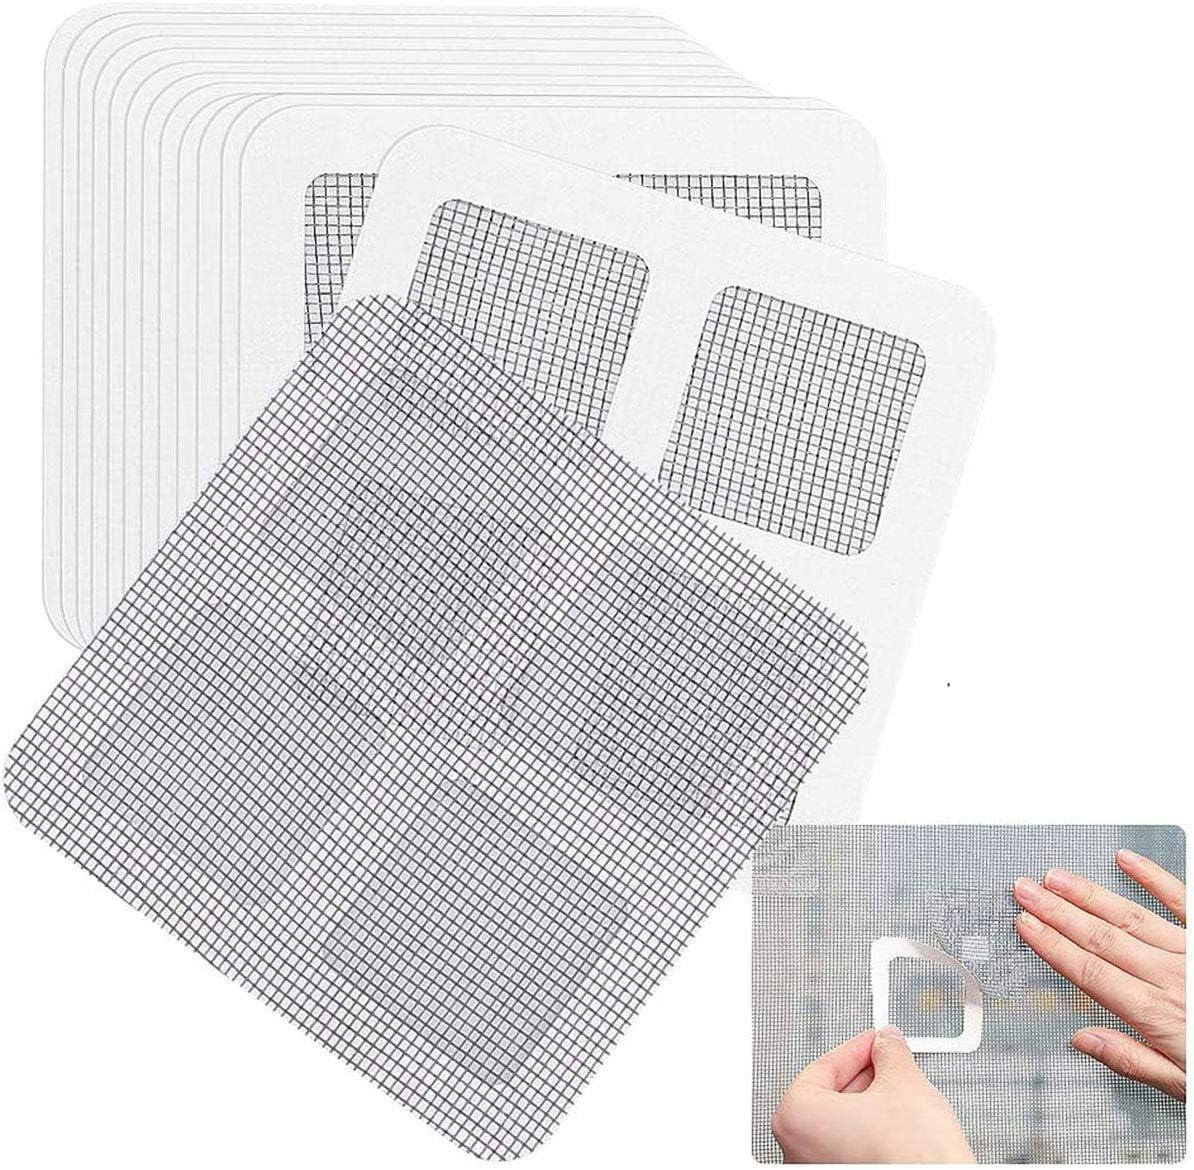 Bingcute Screen Repair Patch Kit, Window and Door Screen Repair Kit,Strong Adhesive&Waterproof Fiberglass Covering Wire Mesh Repair for Holes and Tears,Patches